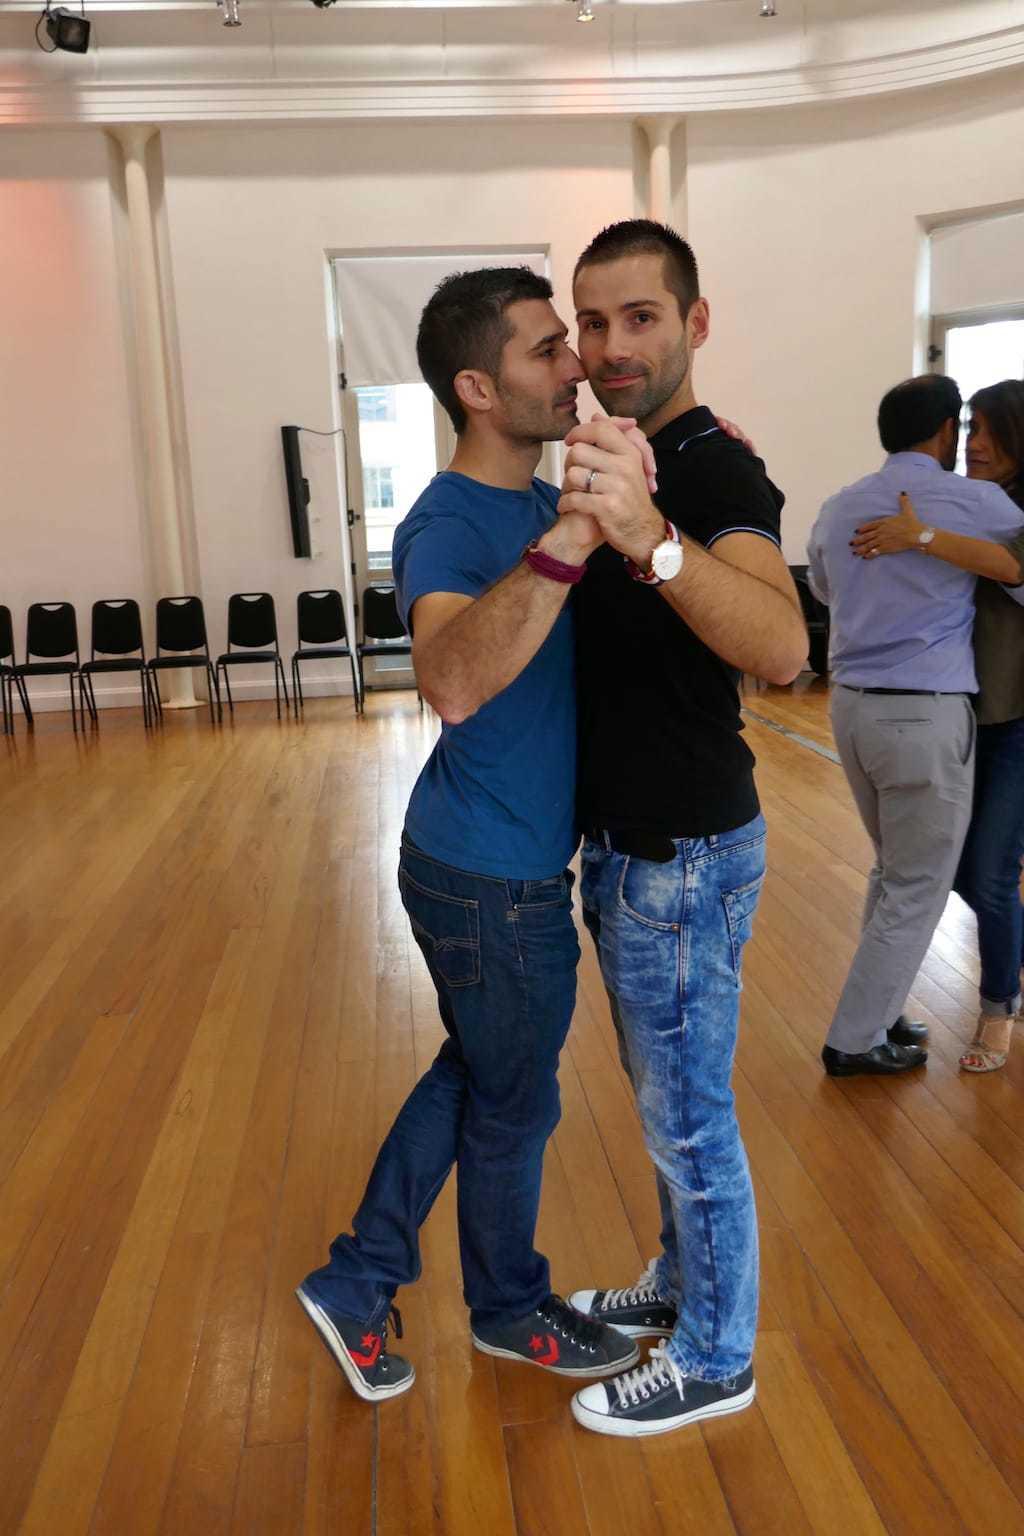 Gay motevideo uraguay